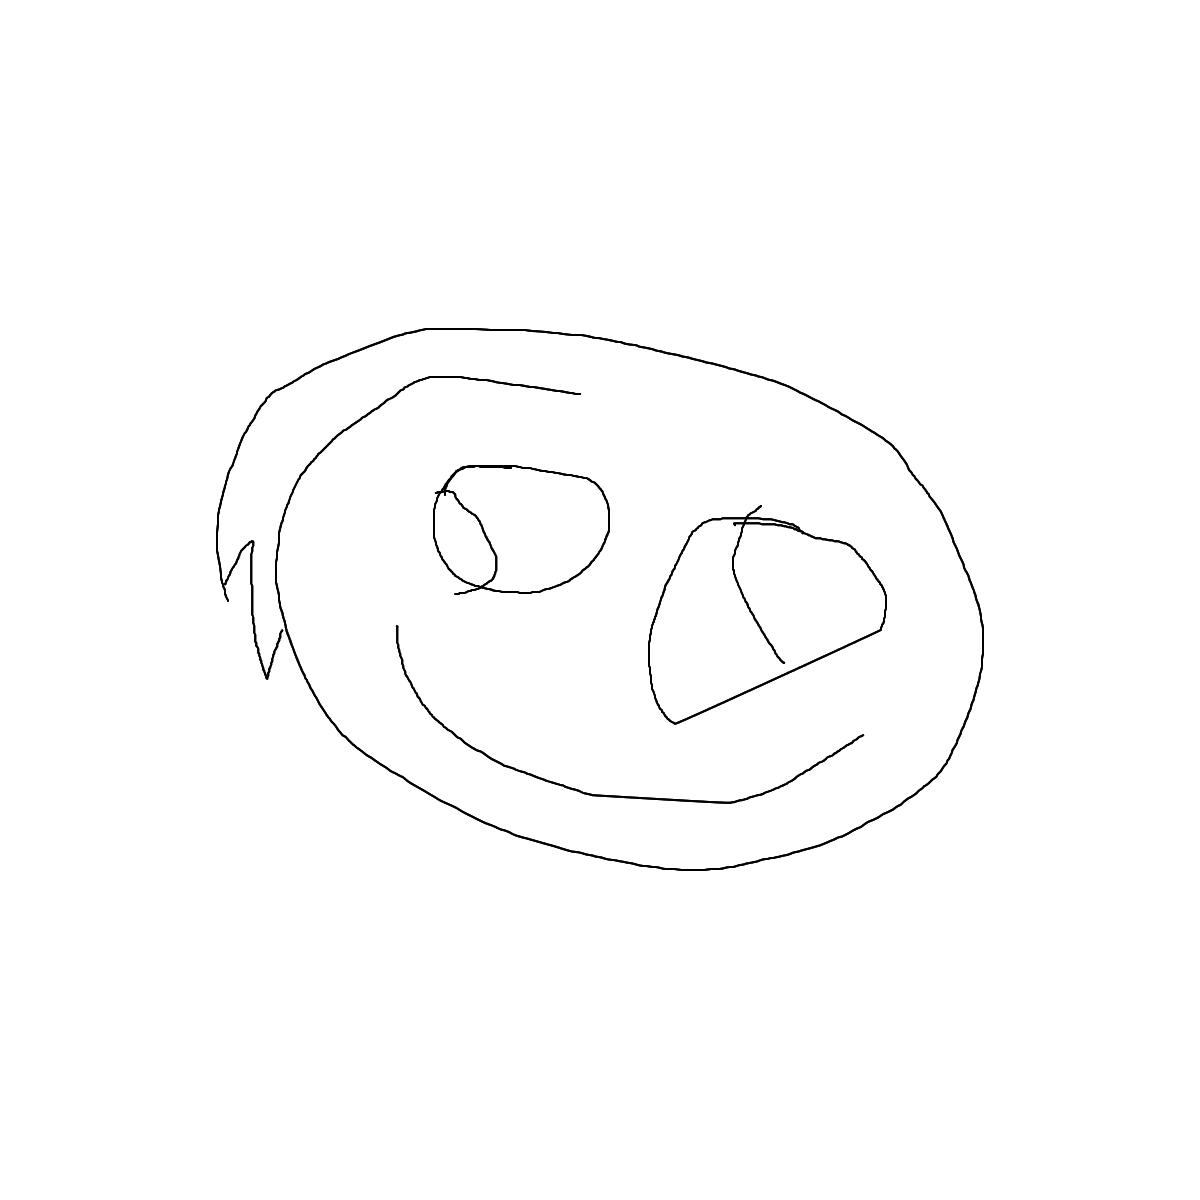 BAAAM drawing#2668 lat:63.5731658935546900lng: 37.9268112182617200